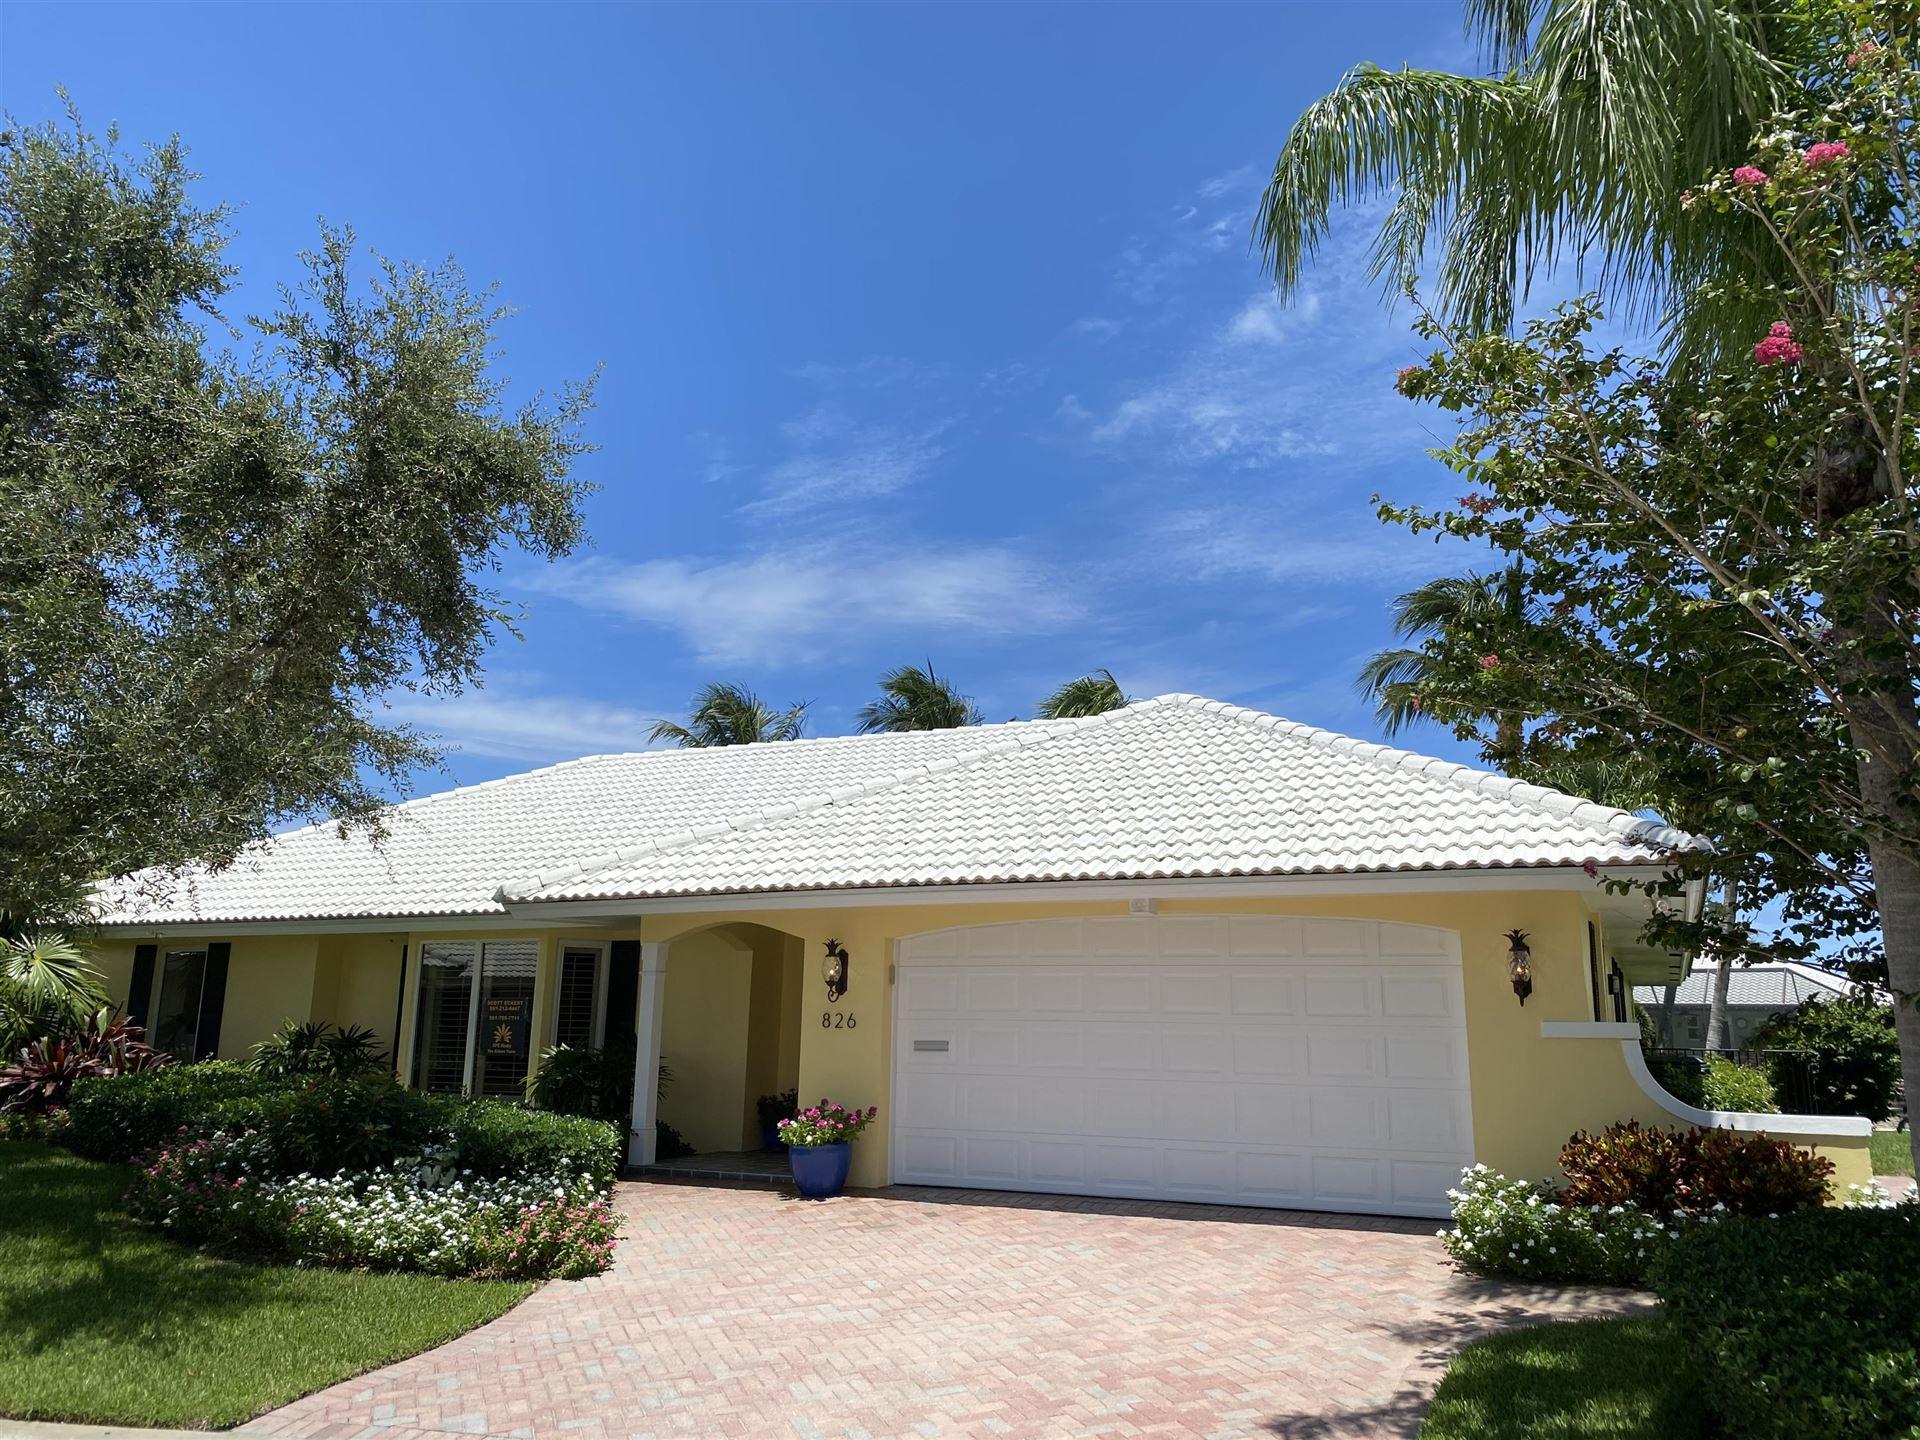 826 SW Walnut Ter Terrace, Boca Raton, FL 33486 - #: RX-10637592